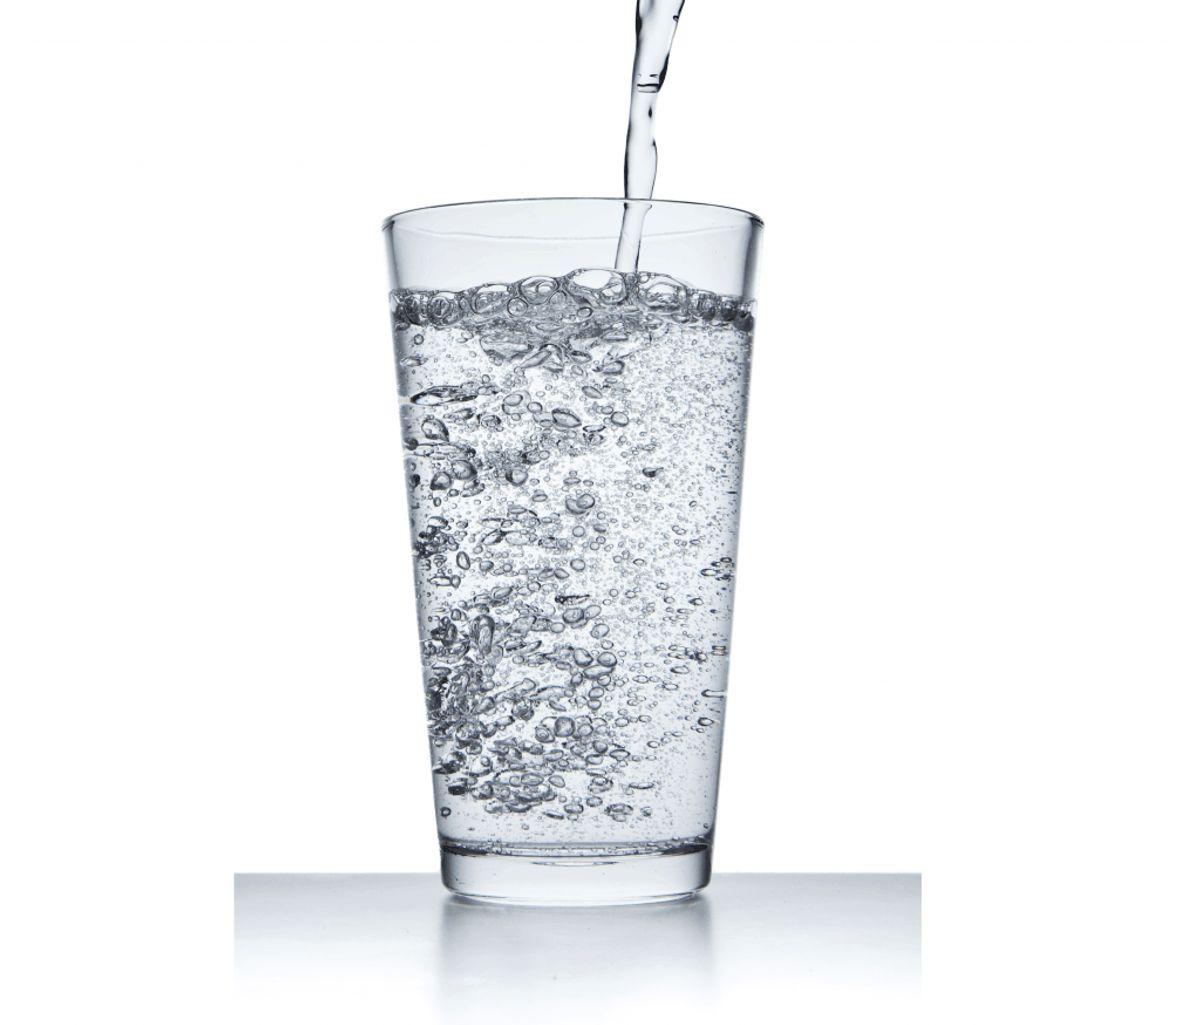 Drik danskvand med brus.